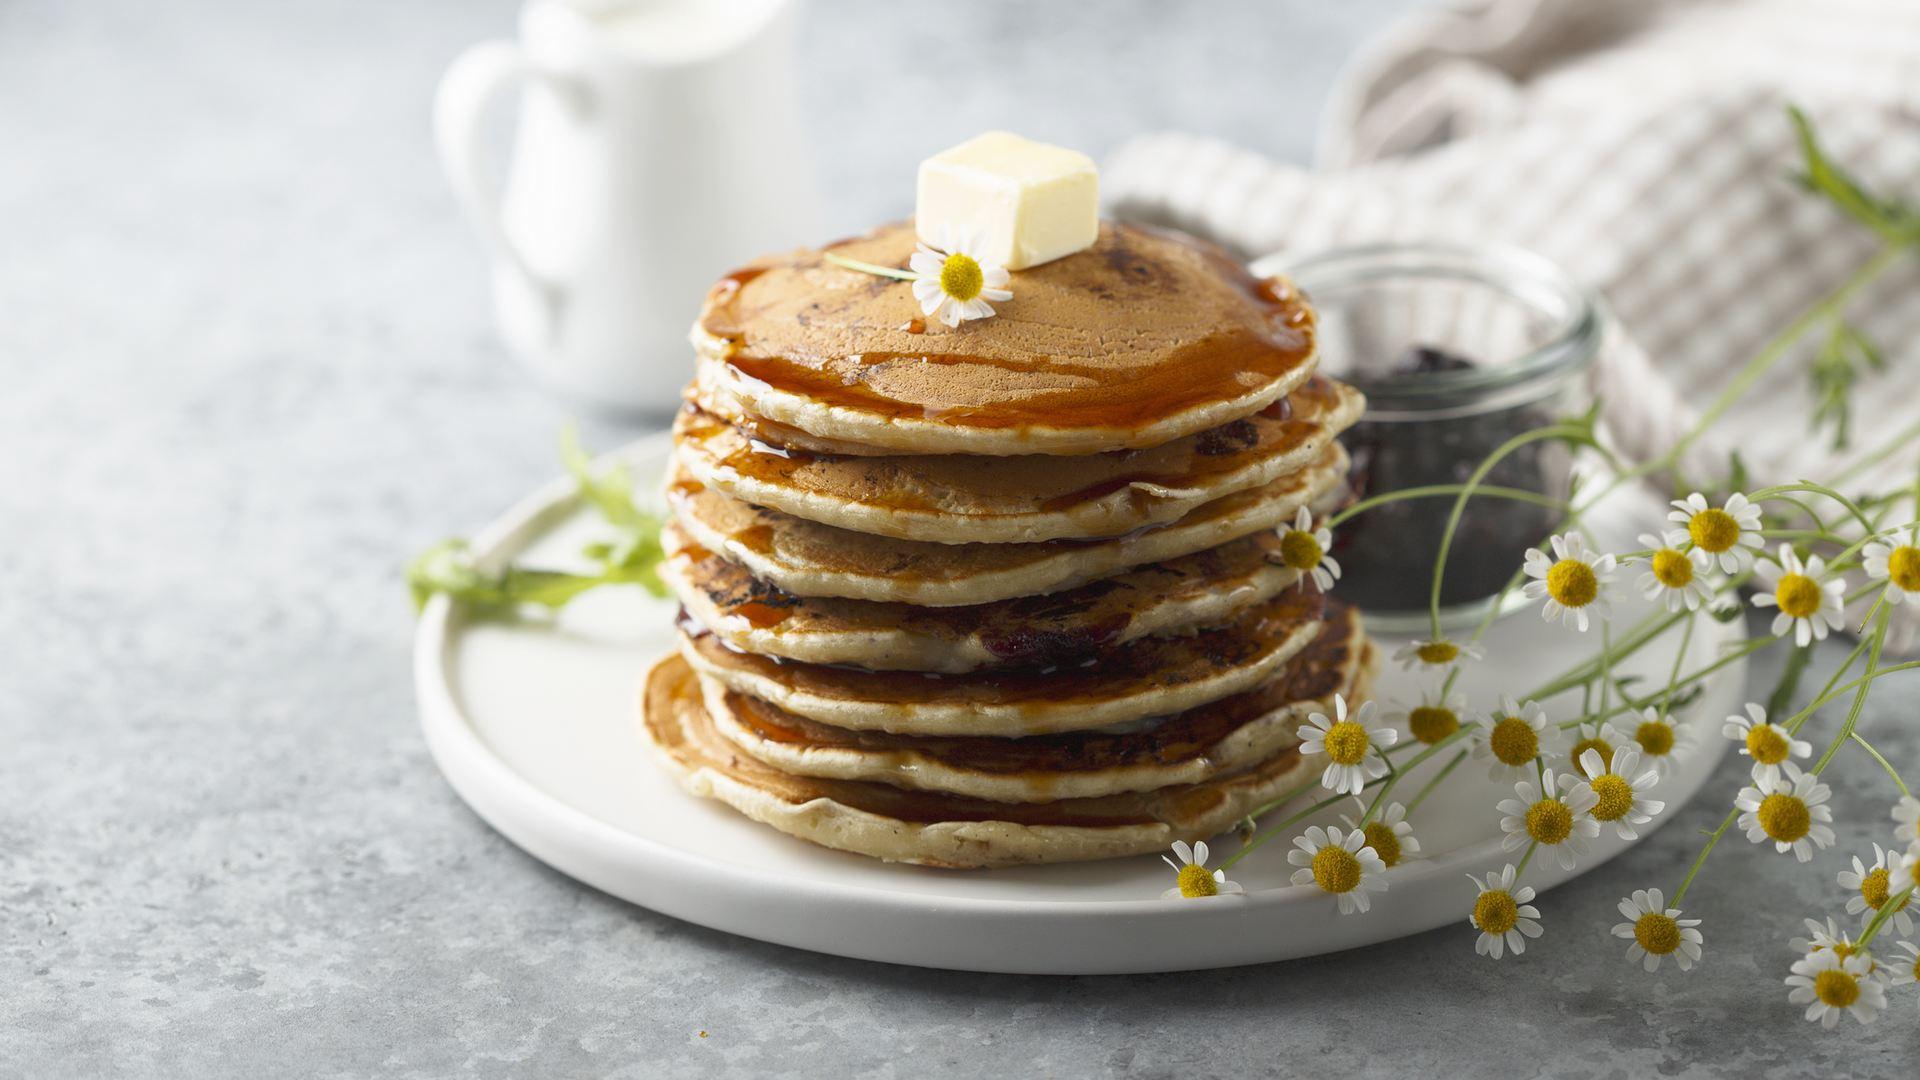 Ricetta In Inglese Traduzione.Ricetta Pancake In Inglese Istruzioni E Ingredienti My English School